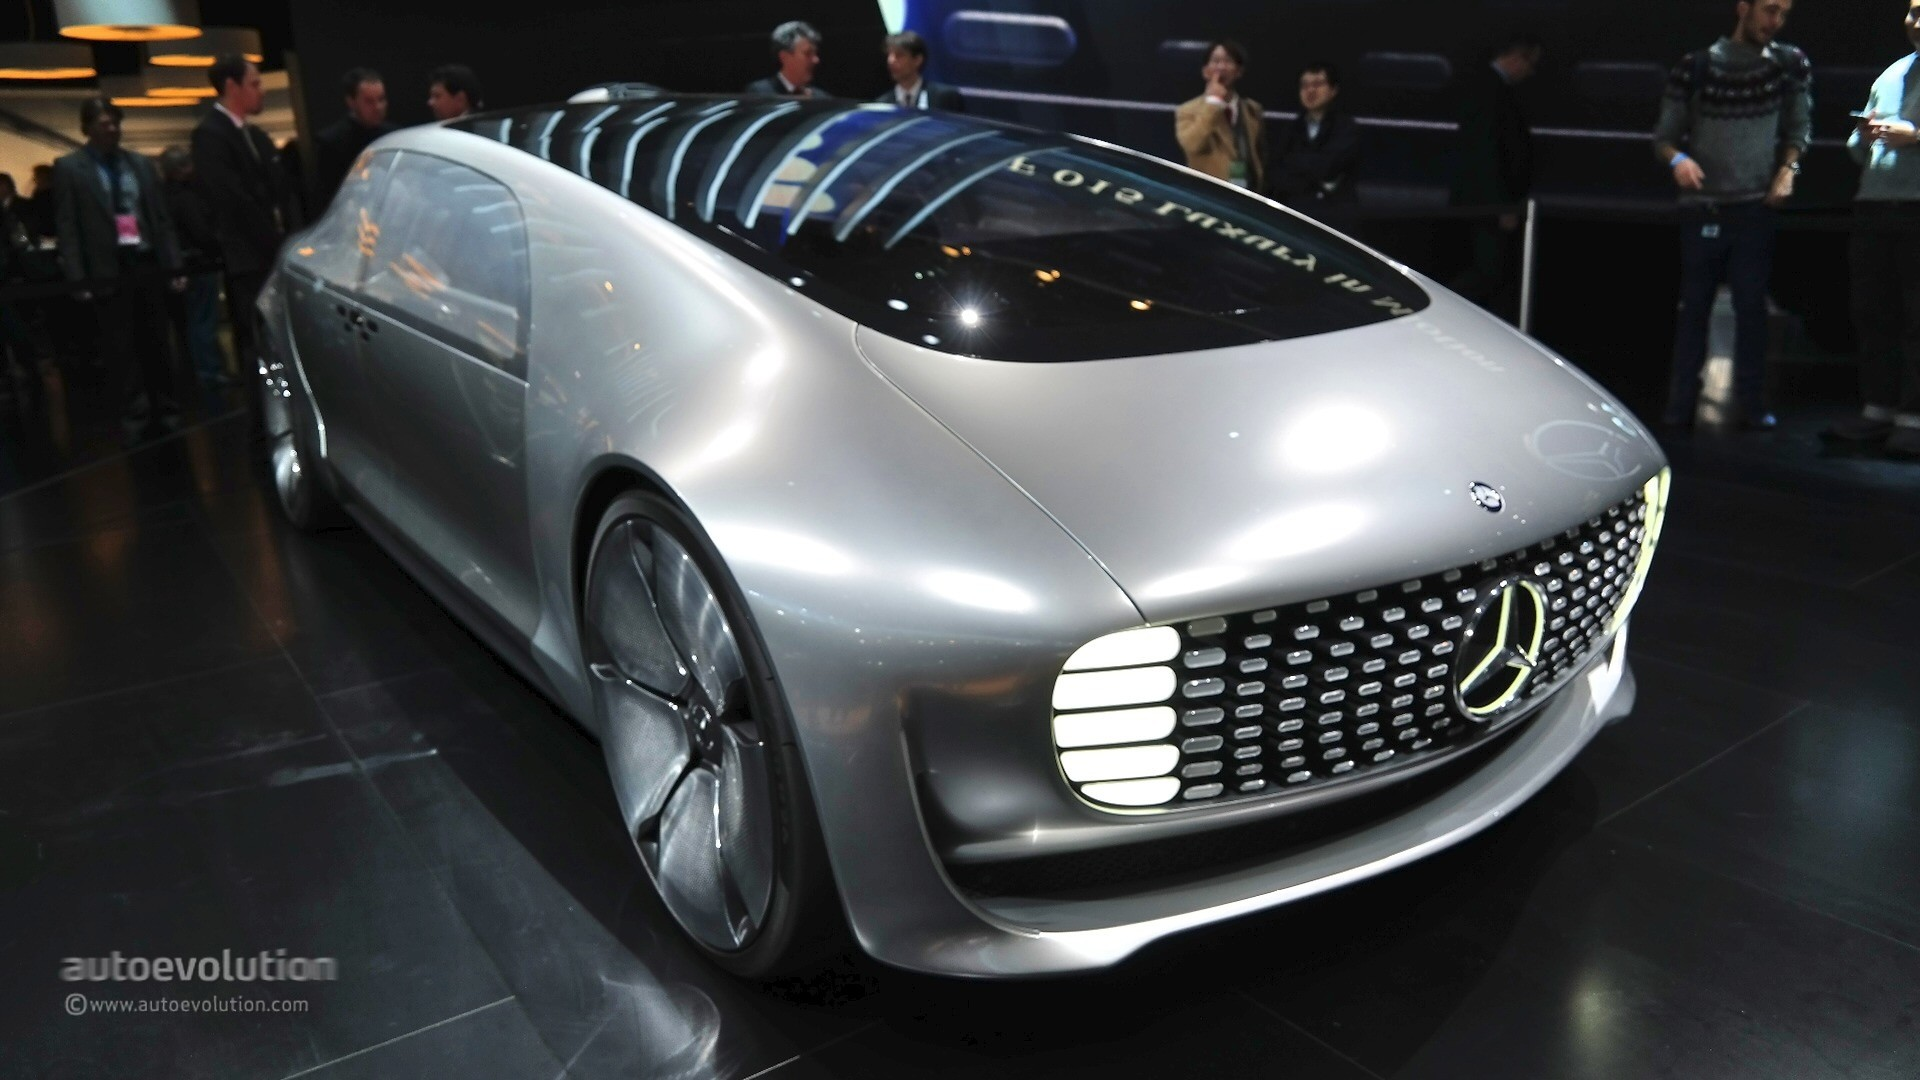 Mercedes Benz F 015 Concept Previews The Future At 2015